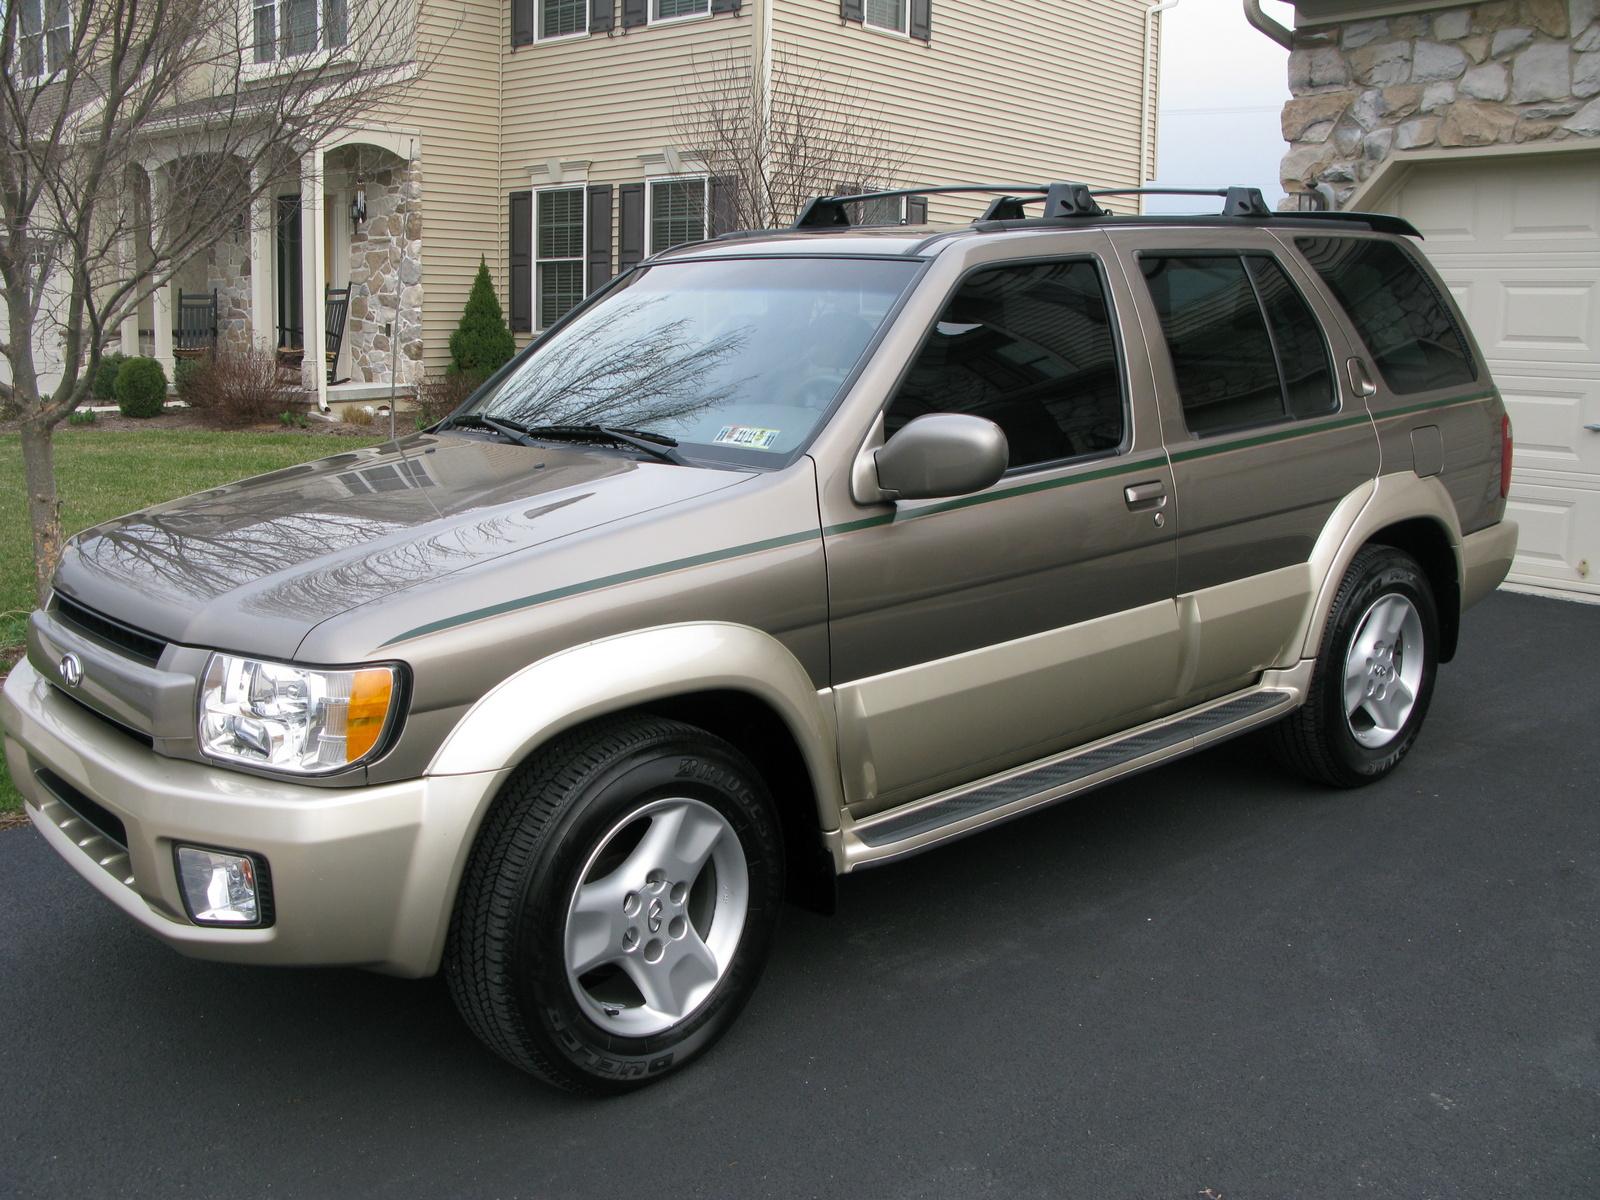 1999 infiniti qx4 lifted diagram 2003 infiniti qx4 lifted gallery hd cars  wallpaper 1999 jeep cherokee